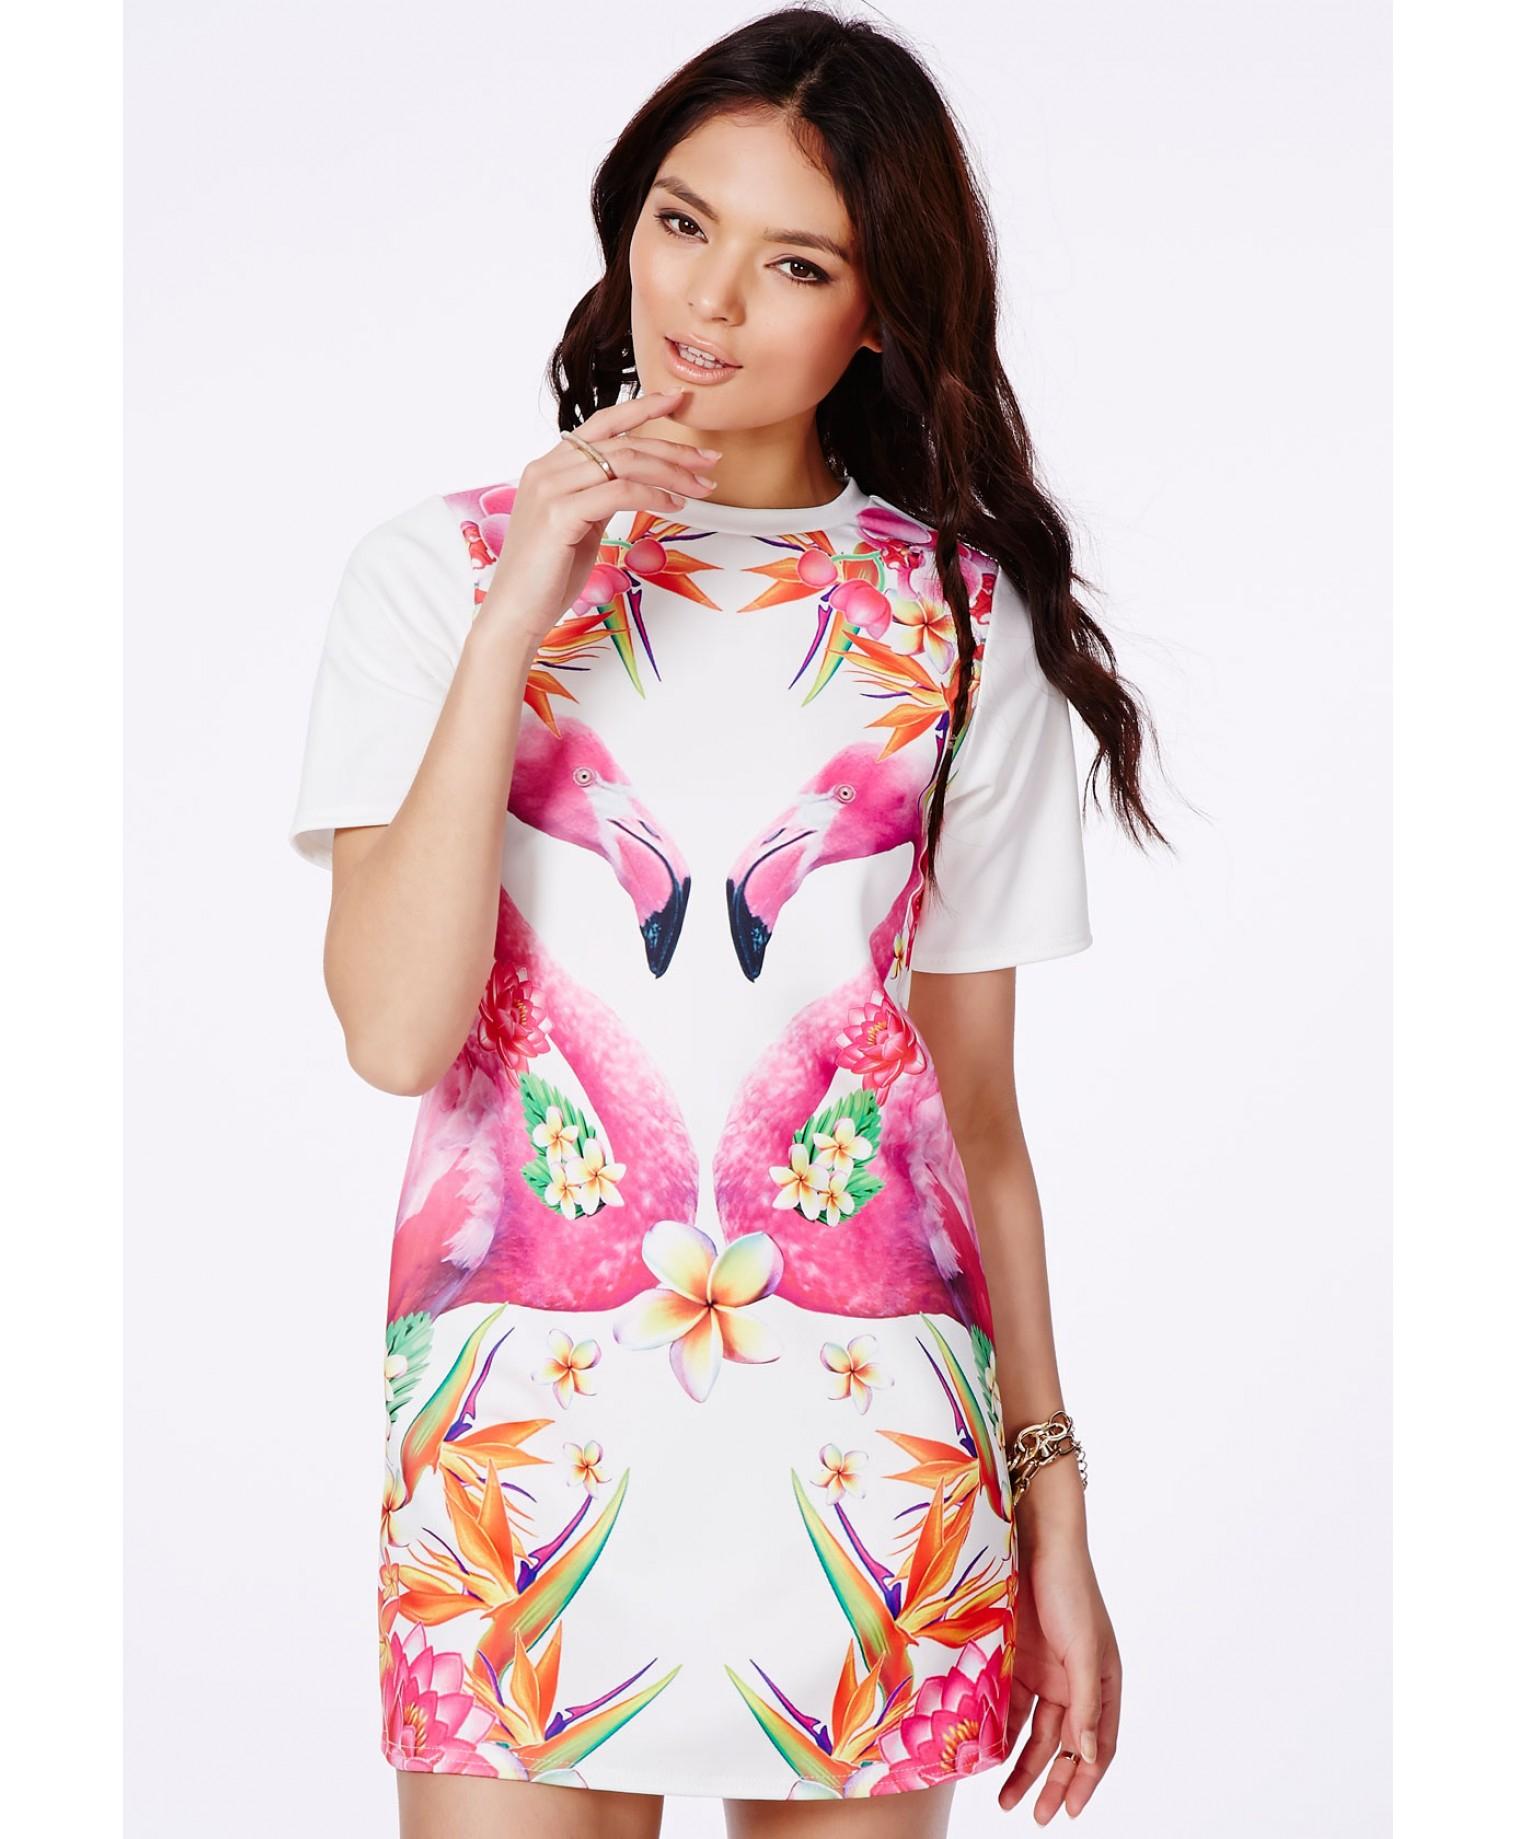 Flamingo clothing for women